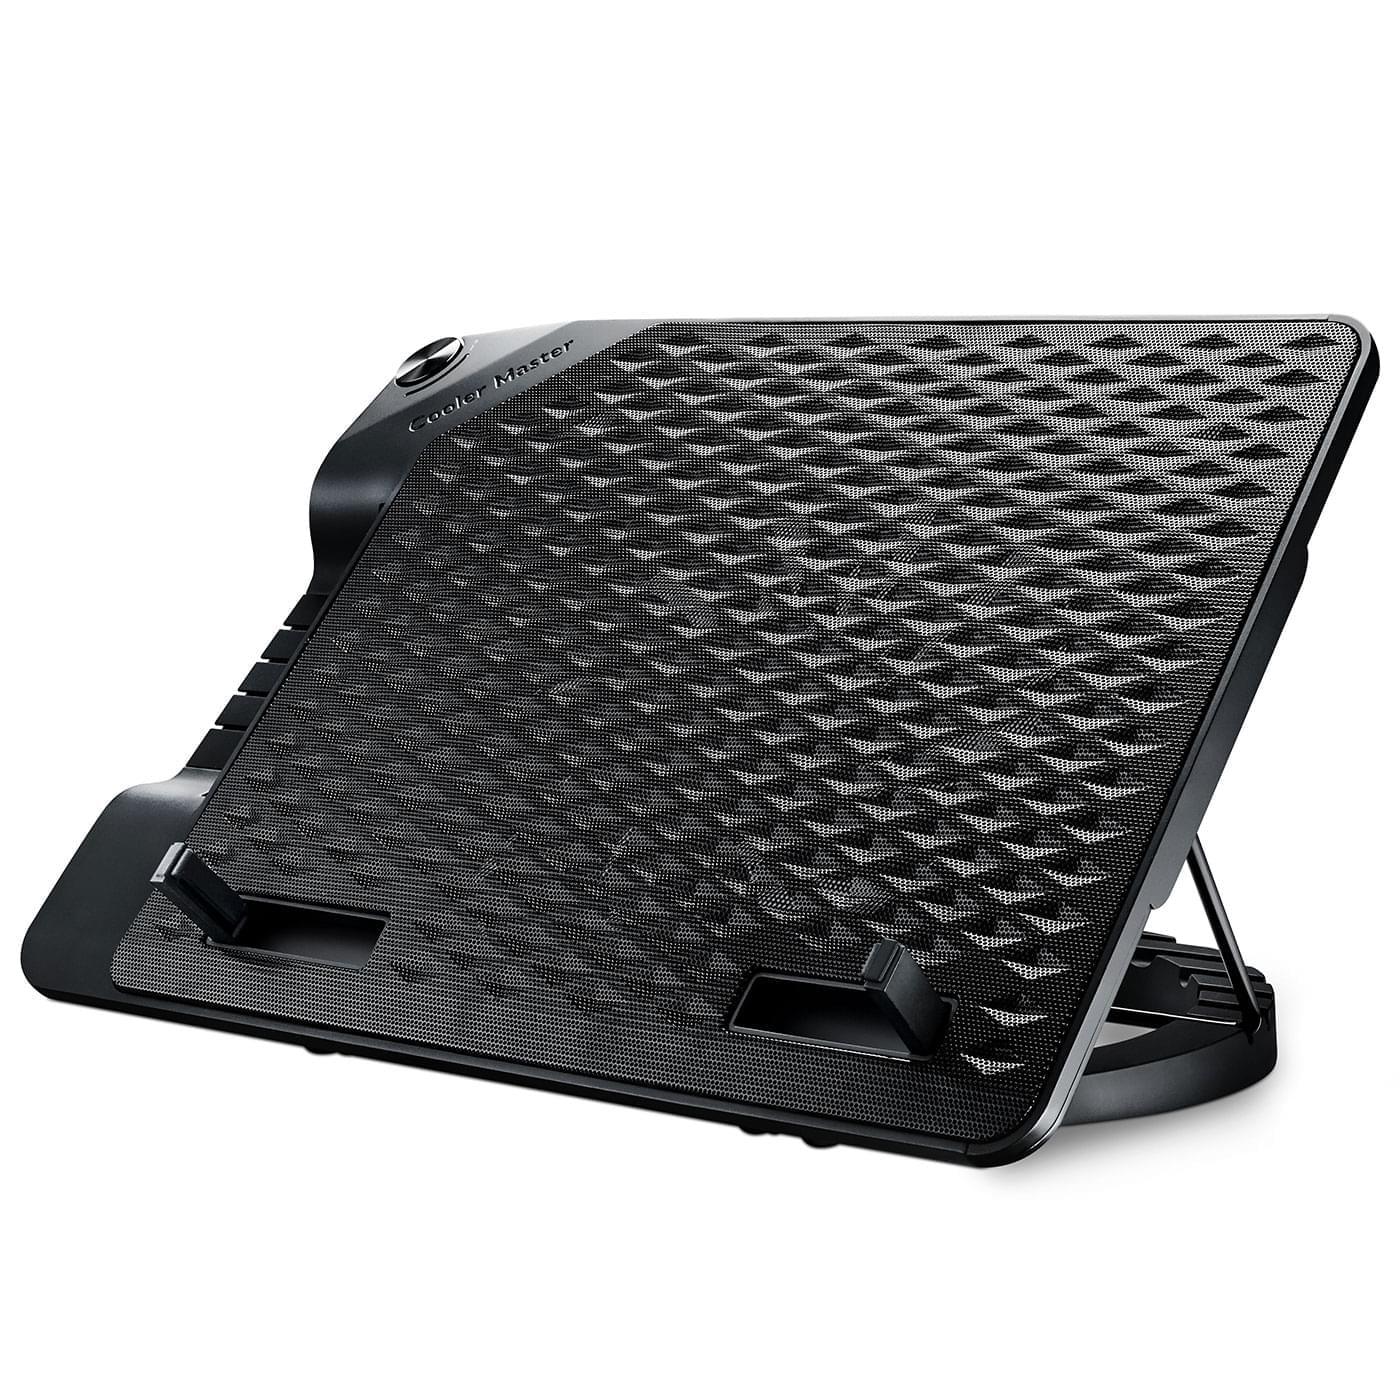 Cooler Master Notepal Ergostand III (R9-NBS-E32K-GP) - Achat / Vente Accessoire PC portable sur Cybertek.fr - 0